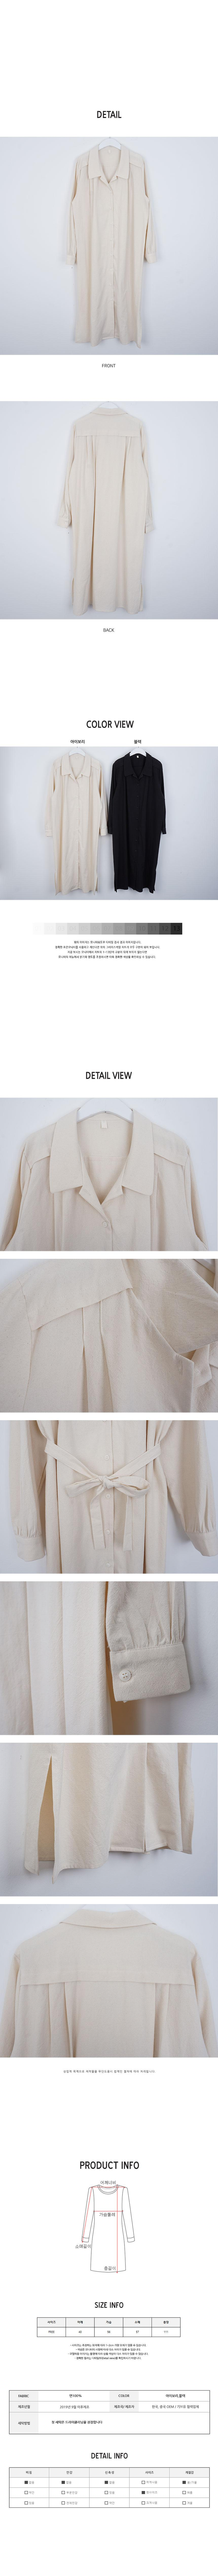 Maren's waist strap dress